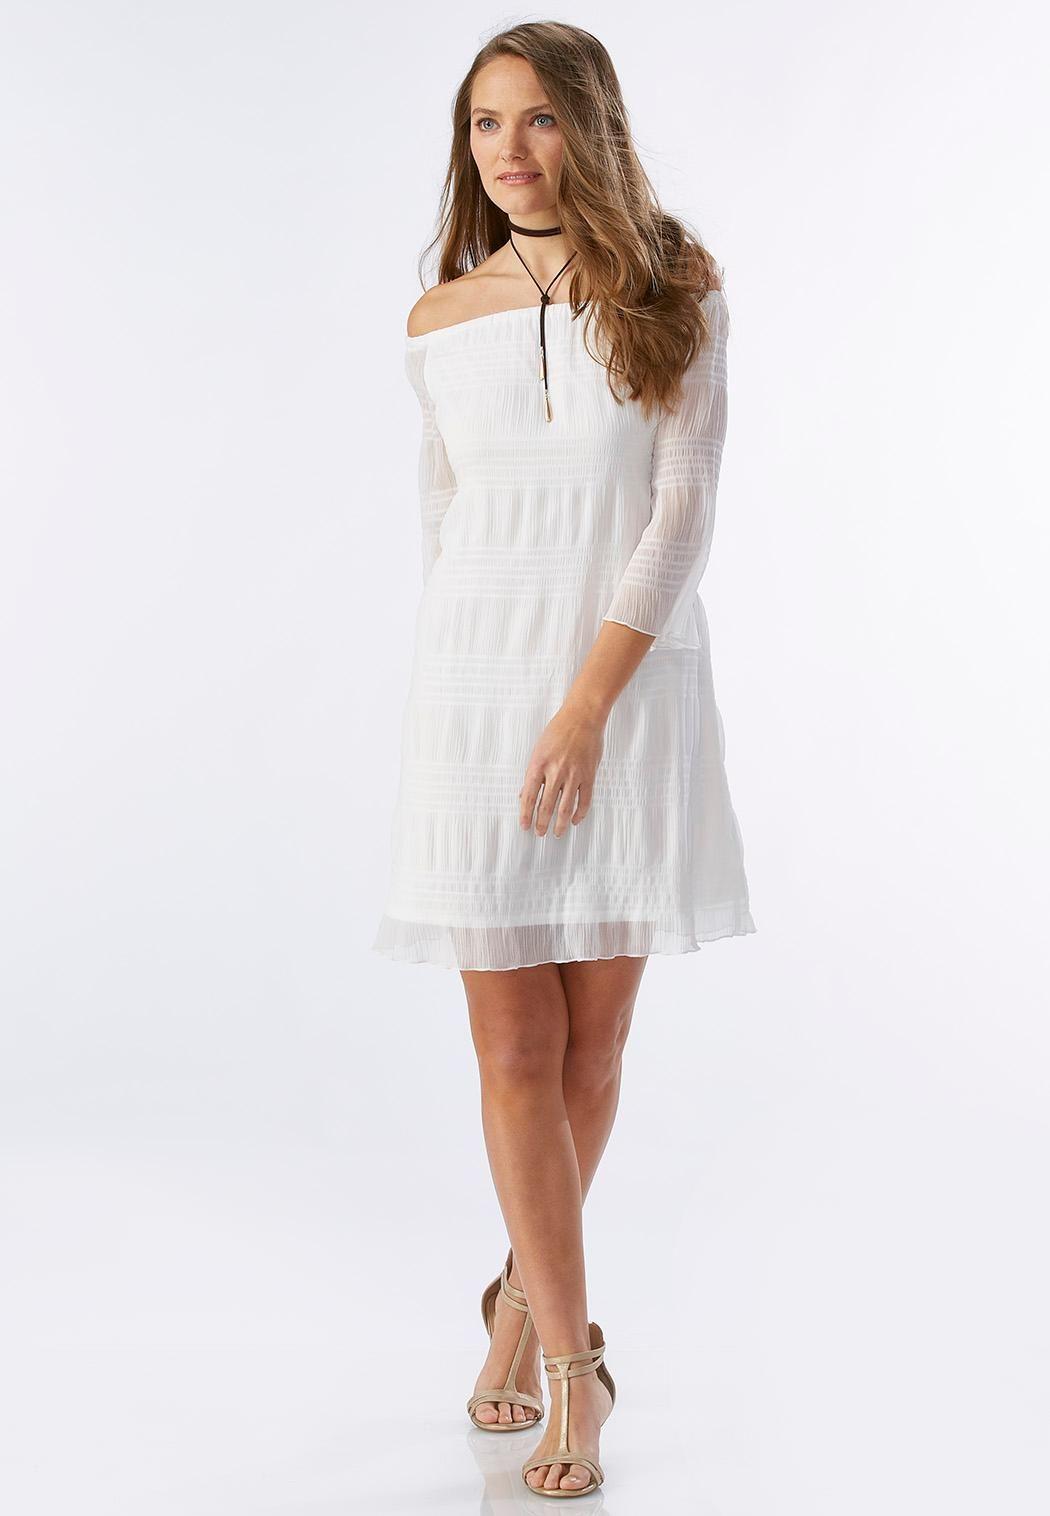 Striped Off The Shoulder Shift Dress Plus Plus Sizes Cato Fashions